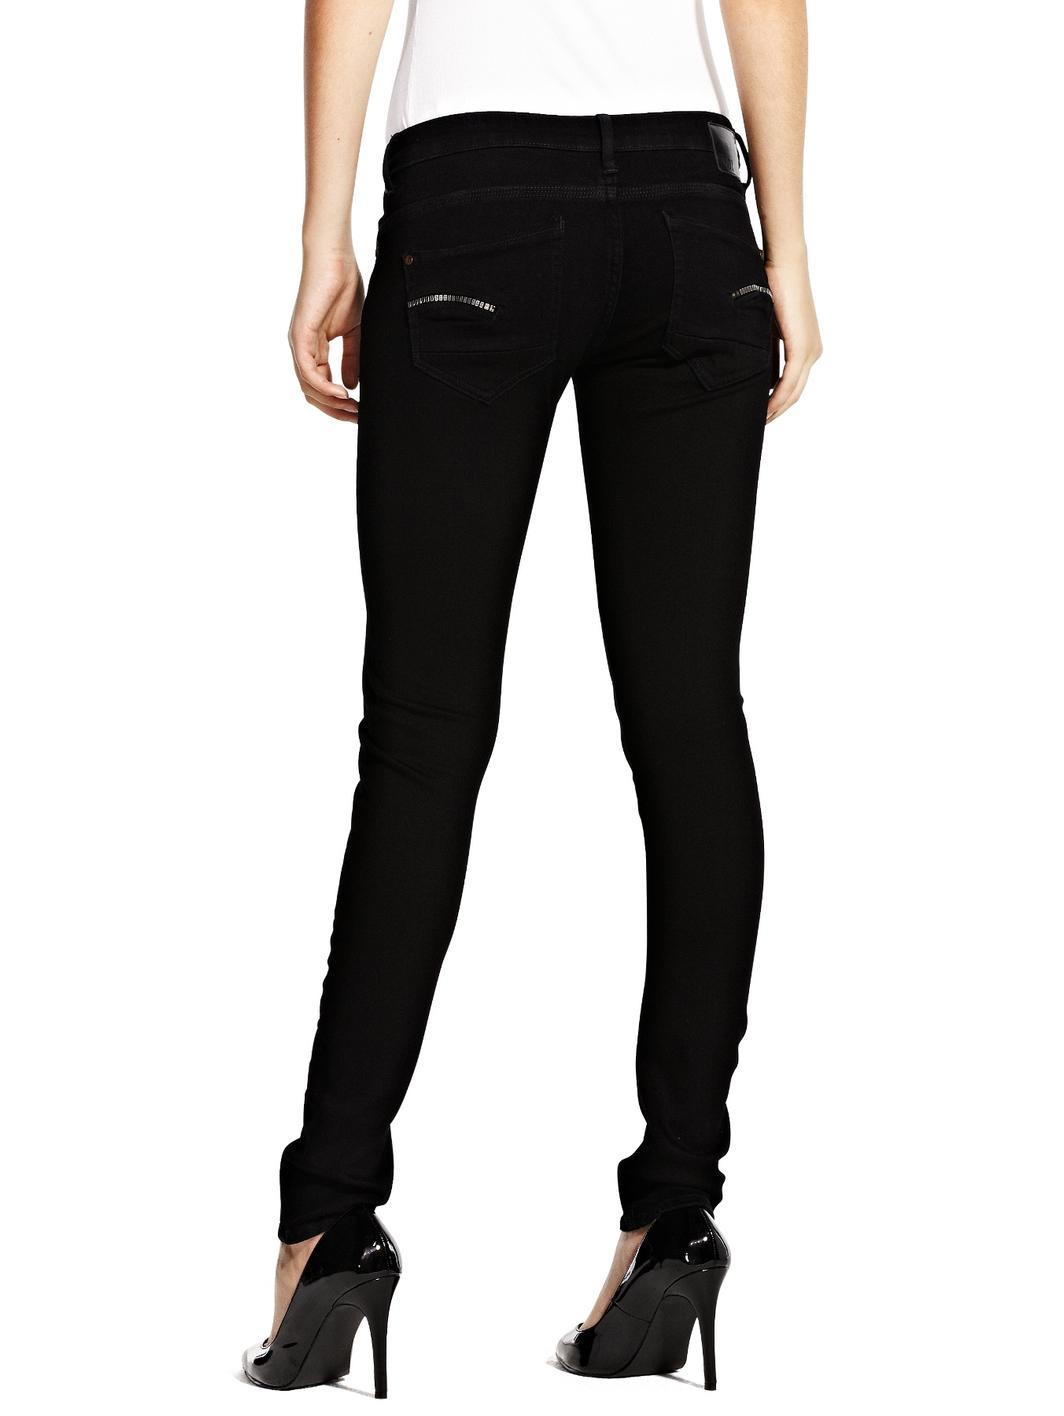 g star raw gstar raw radar smith skinny jeans raw in black. Black Bedroom Furniture Sets. Home Design Ideas